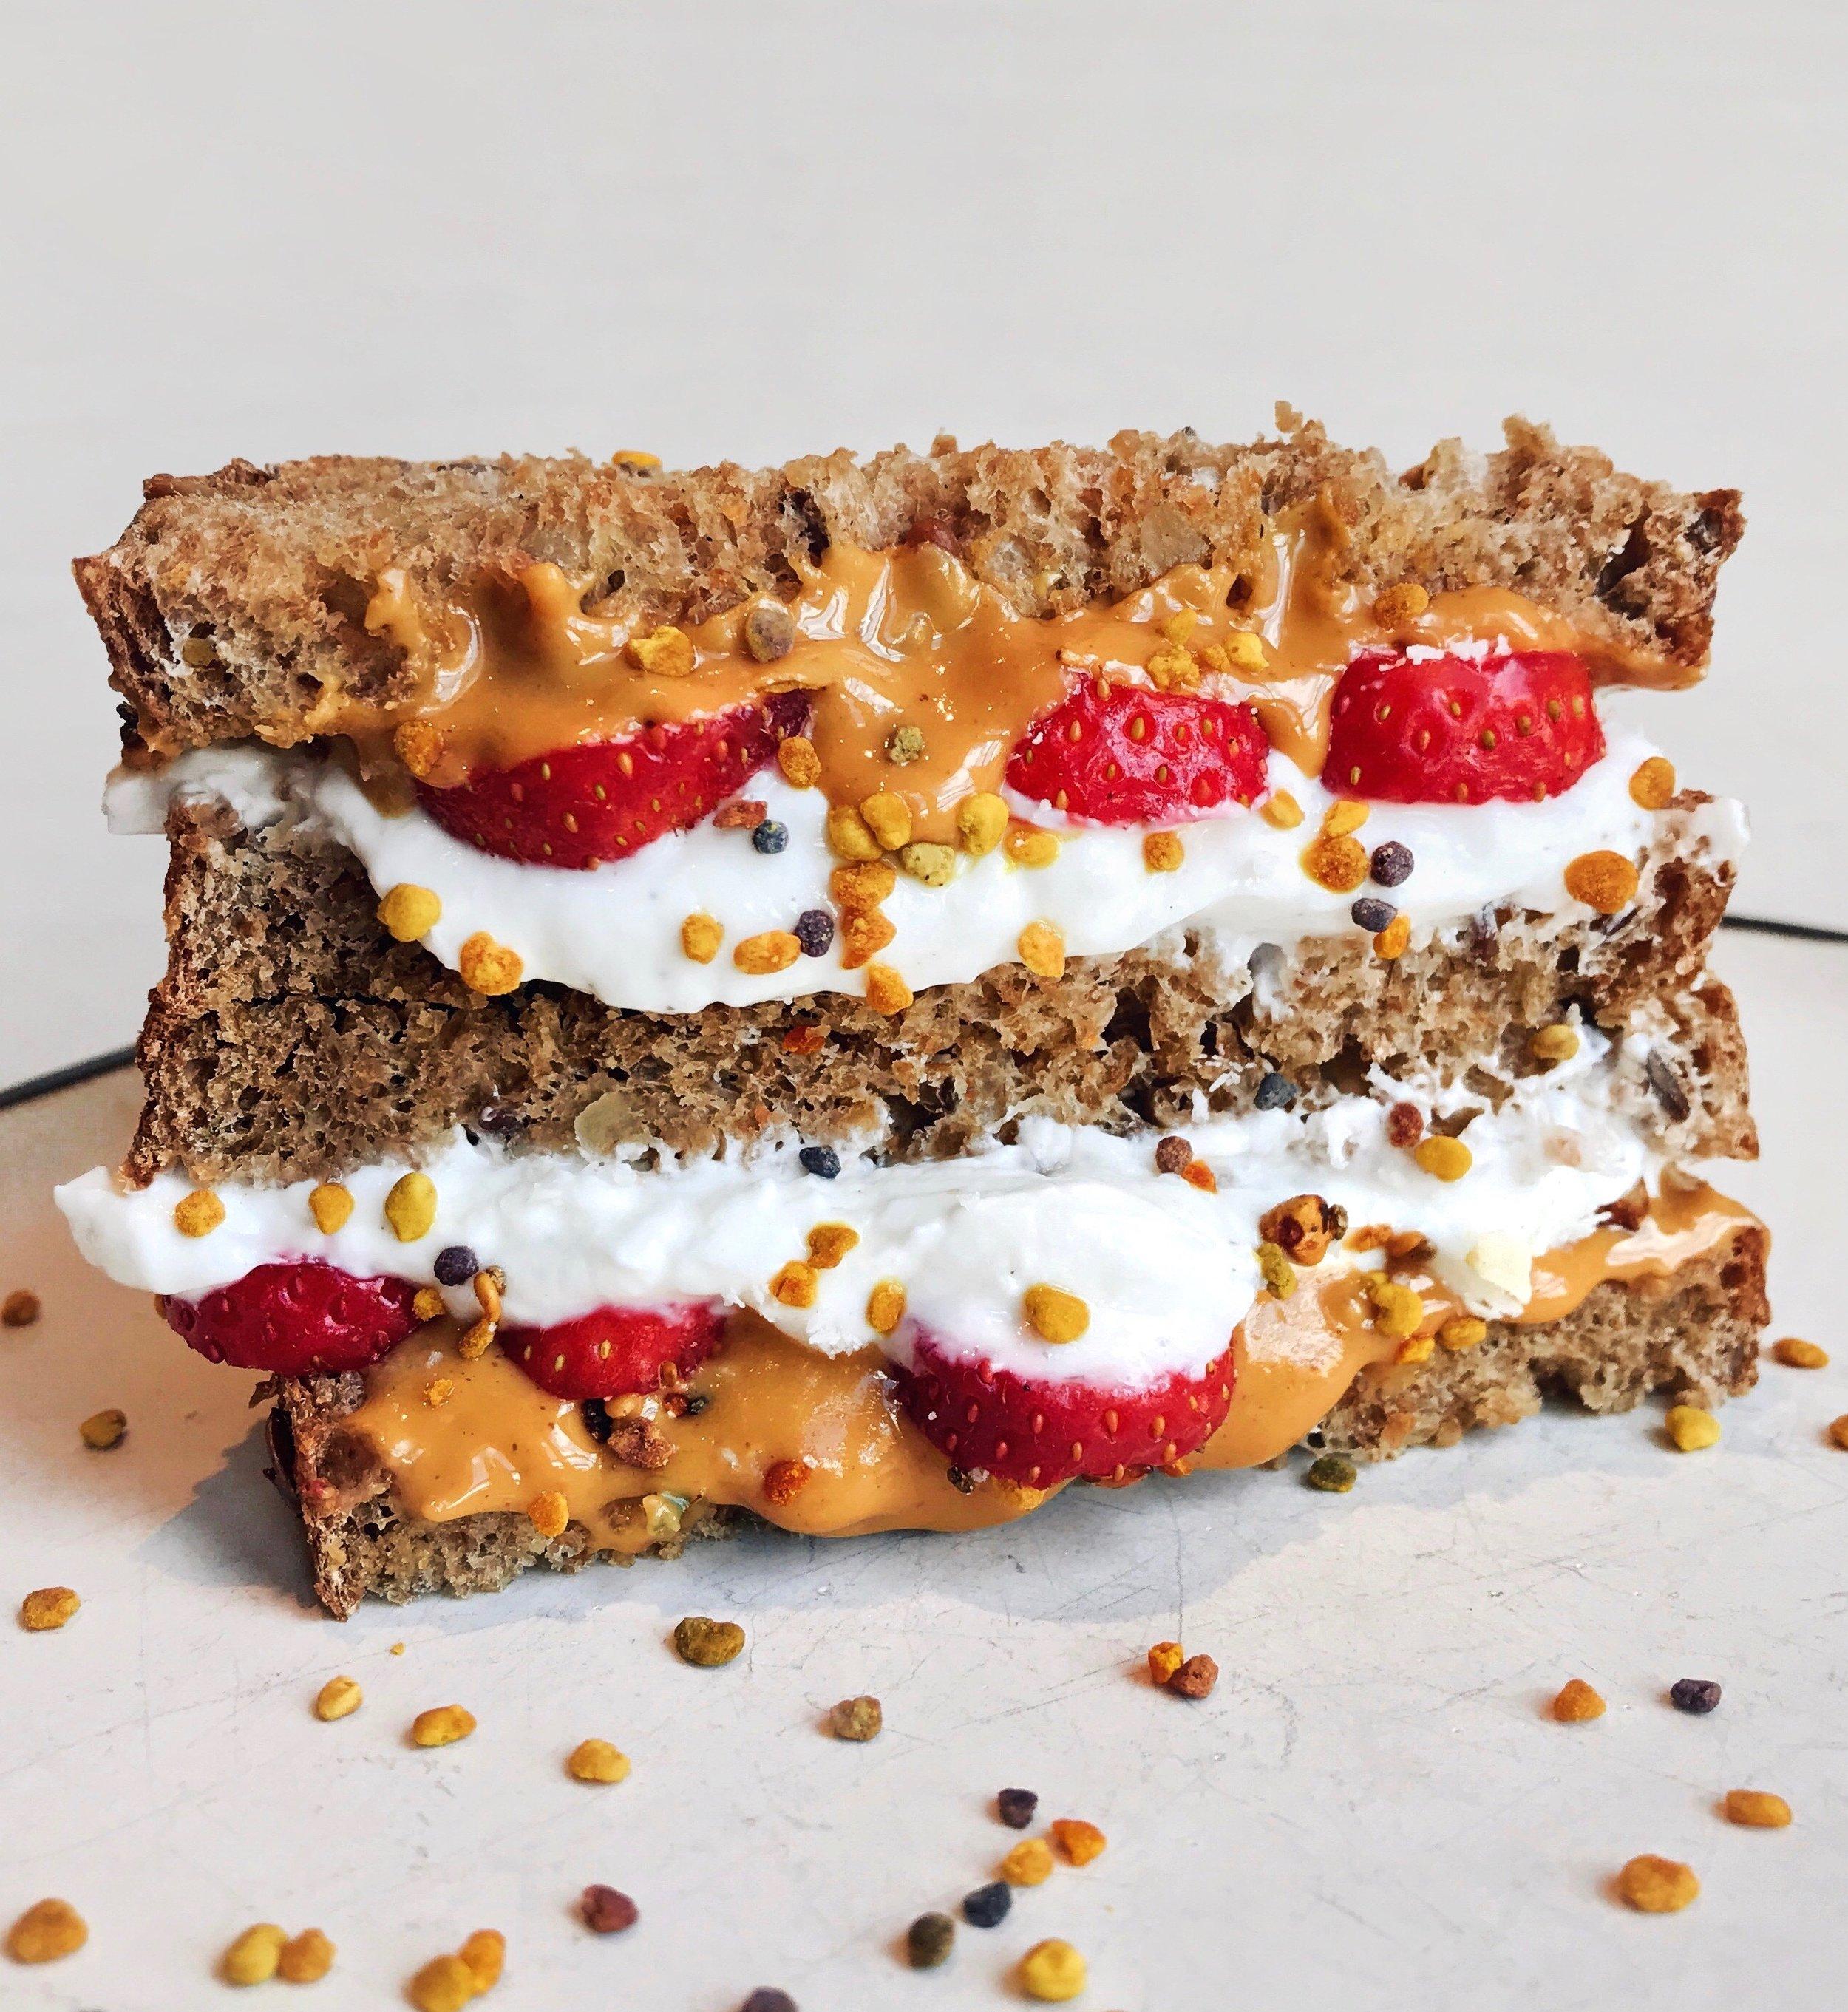 Creamy PB, Strawberry & Greek Yogurt Sammie - Toasted multigrain bread topped with @wild_friendspeanut butter +@driscollsberrystrawberries +@fagegreek yogurt +@koro_frbee pollen (you can use the code «werner » for a 5% online discount)